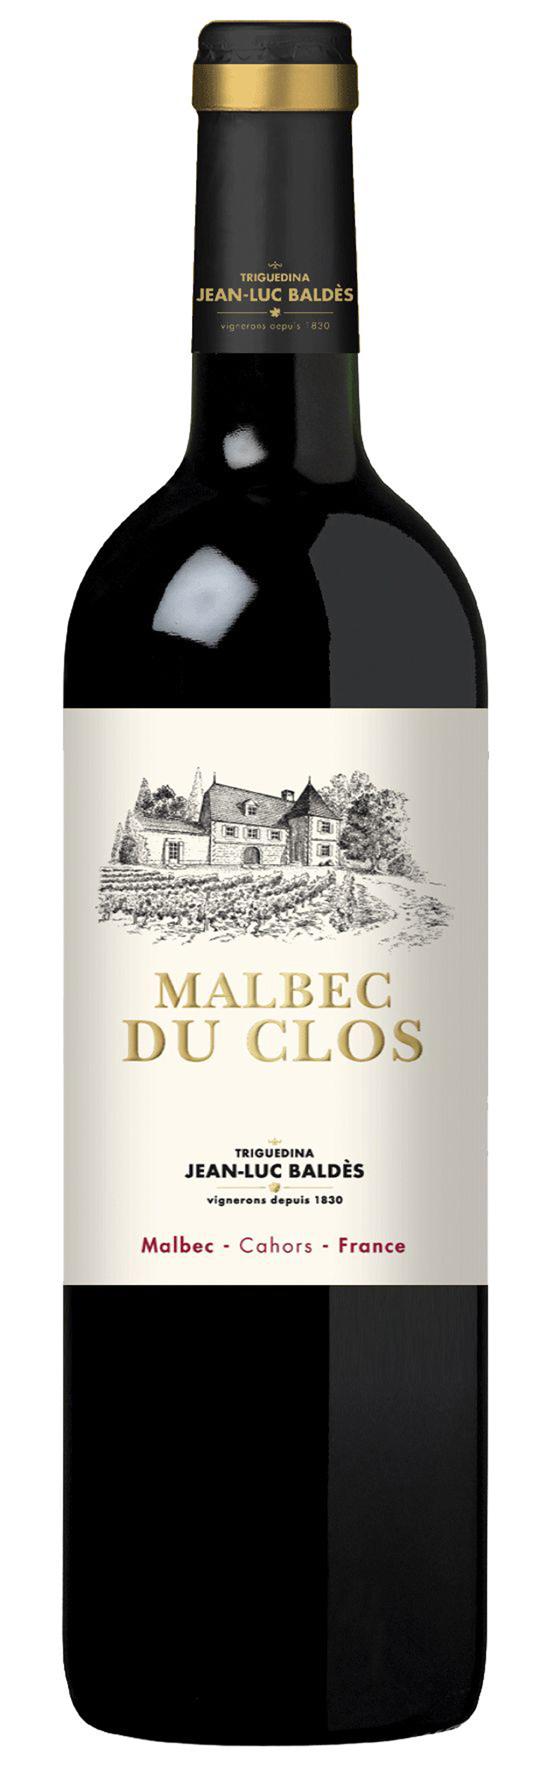 Malbec du Clos JEAN-LUC BALDÈS CAHORS 2012